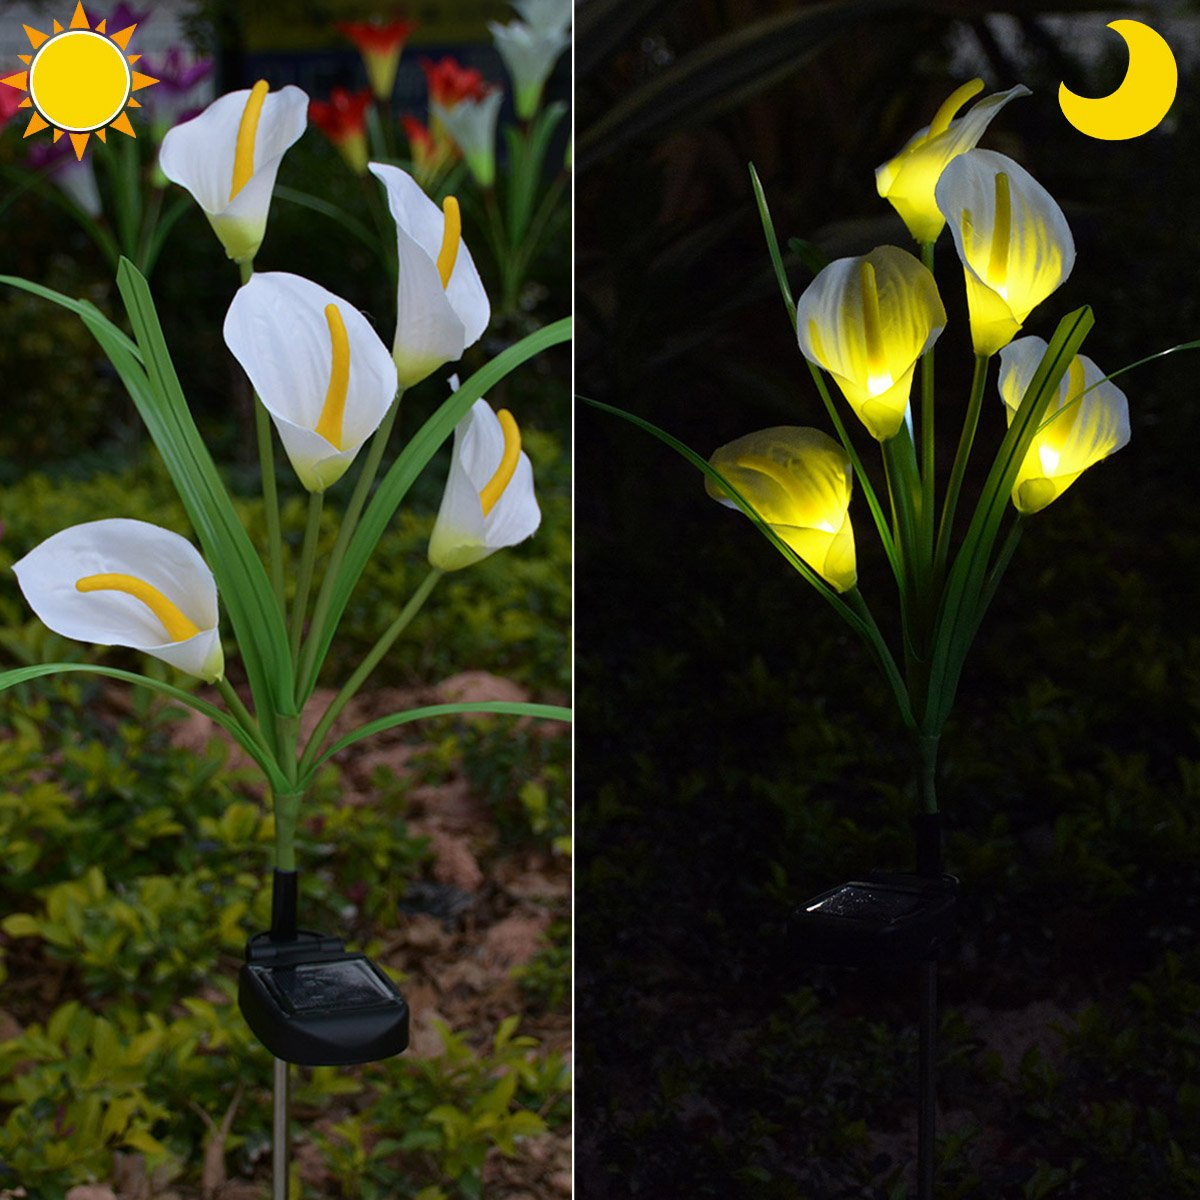 Chasgo Solar Decorative Garden Stake Light Outdoor, Led Lighting Calla Lily Flower Solar Graden Light Outdoor Stake, White Cally Lily Flower